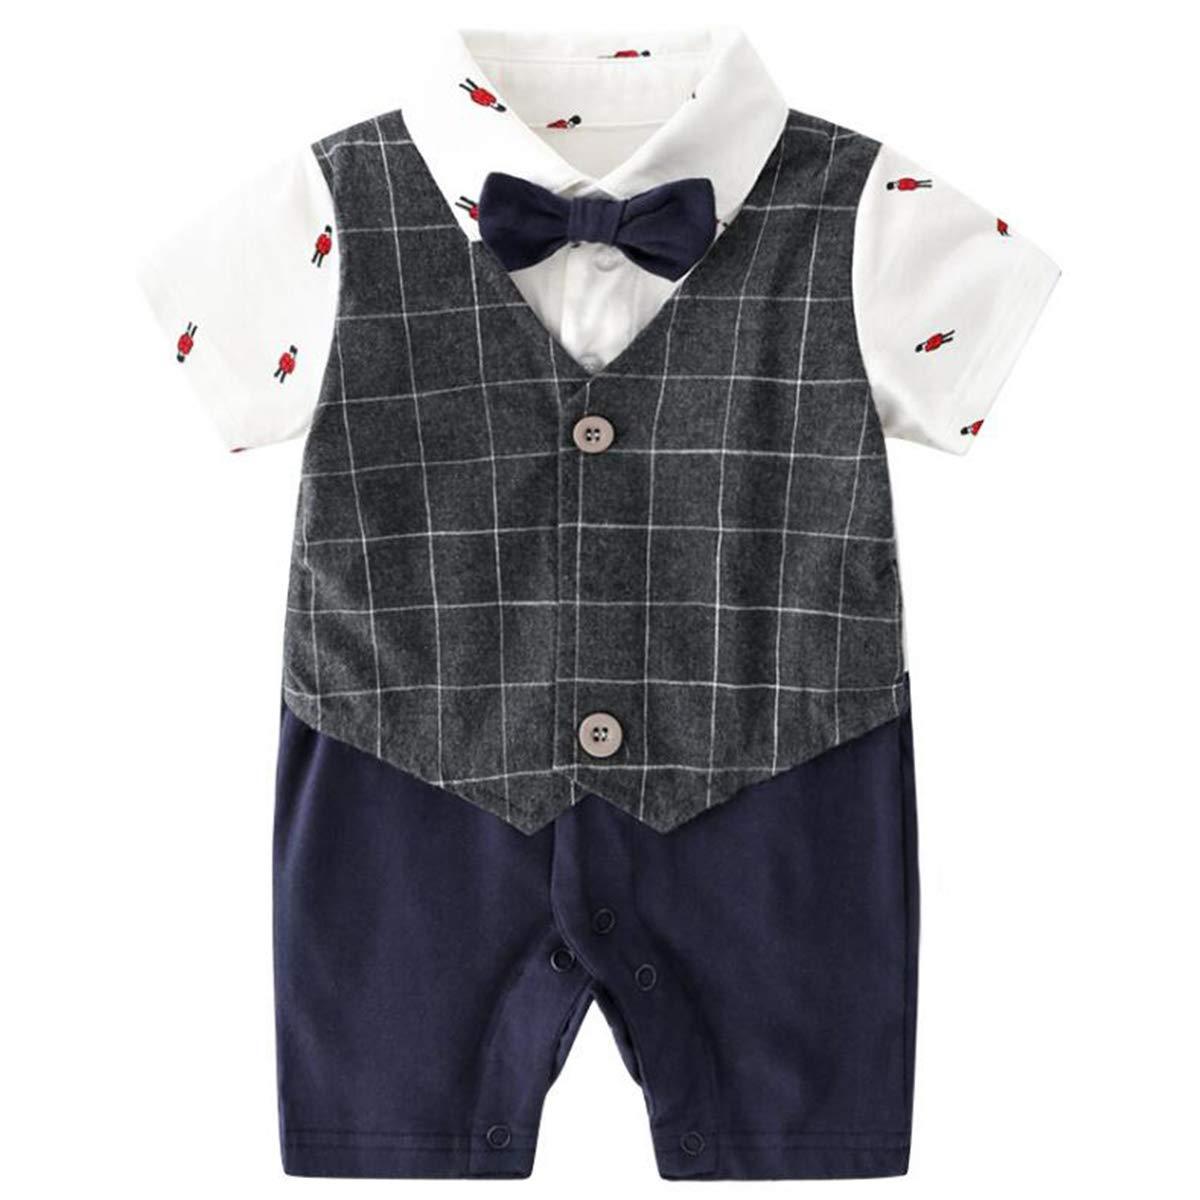 famuka 0-24M Baby Boy Gentleman Romper Long Sleeve Onesie